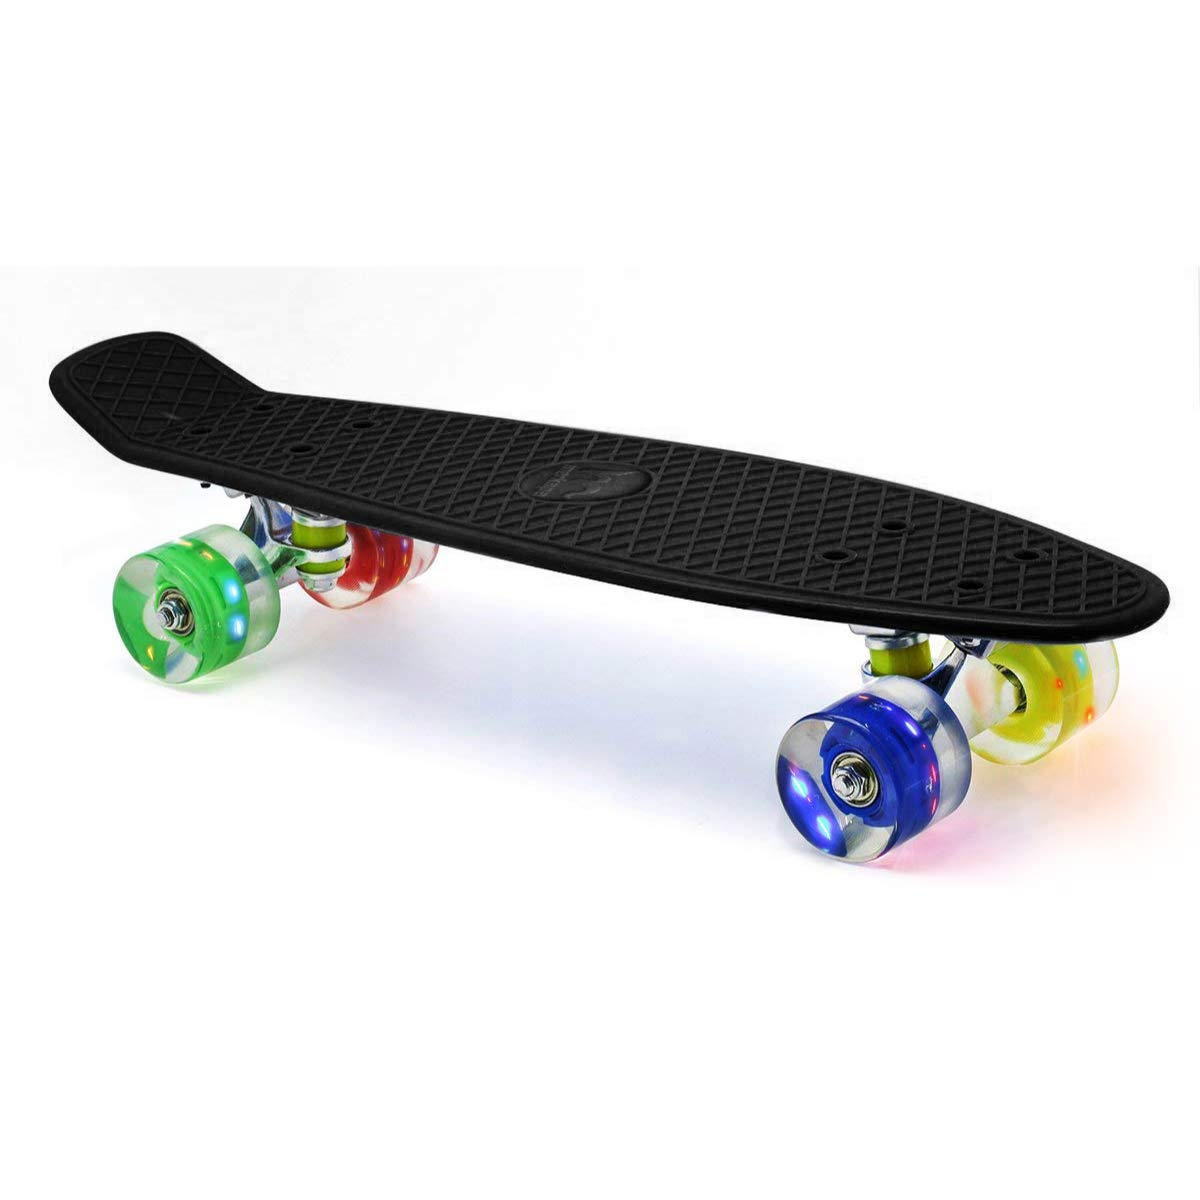 Merkapa 22'' Complete Skateboard with Colorful LED Light Up Wheels for Beginners (Black)